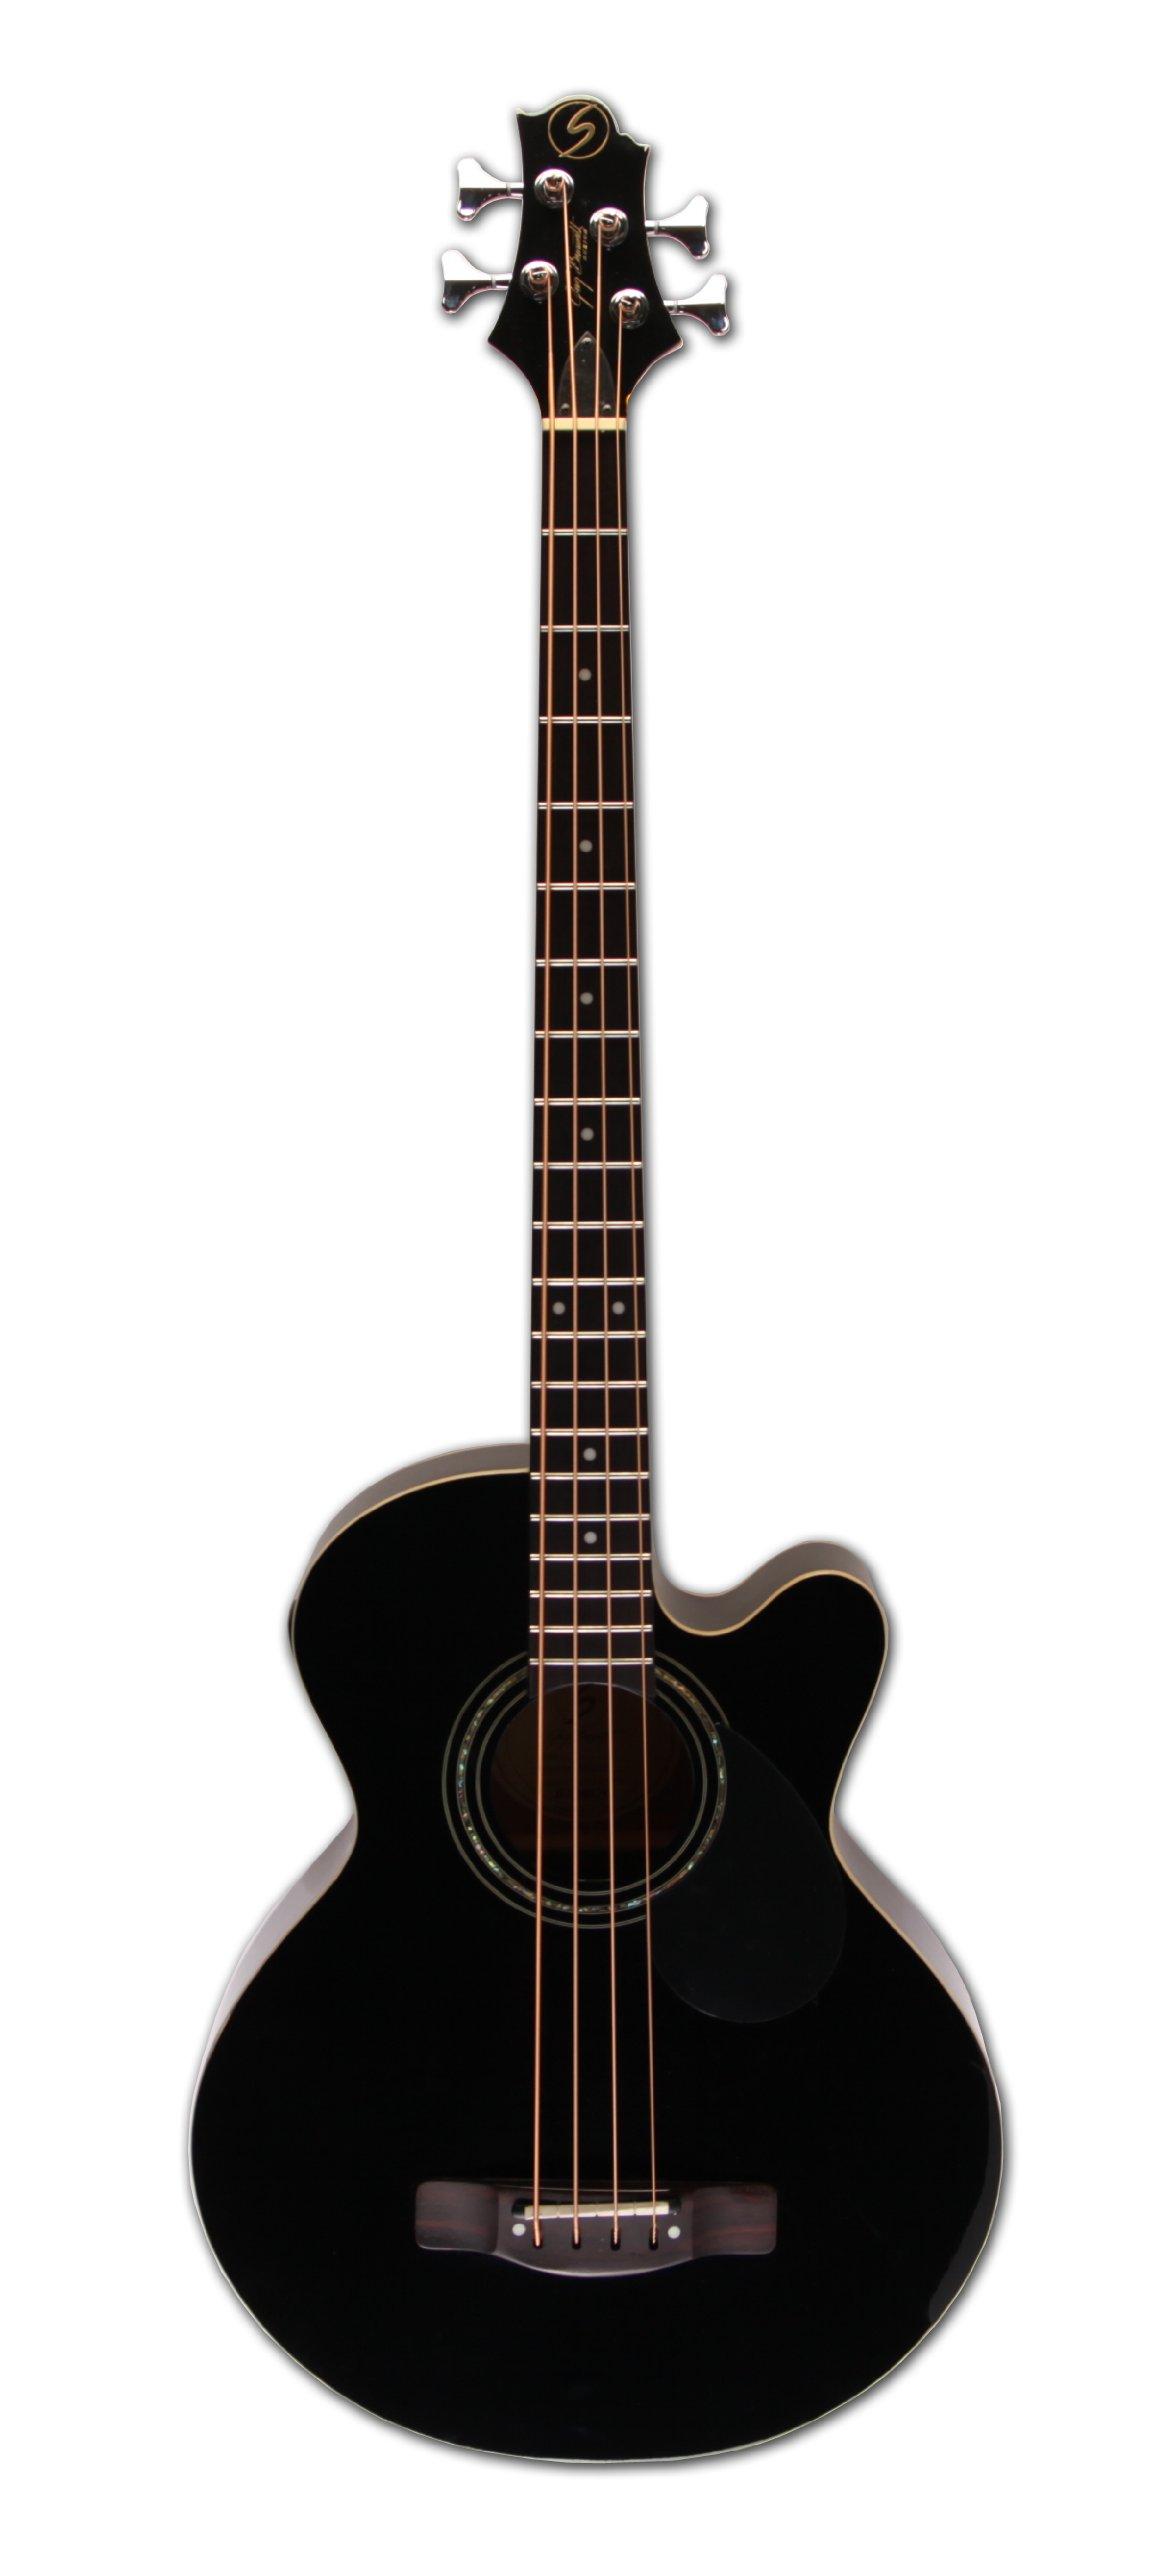 Greg Bennett Design Regency AB2 BLK 4-String Acoustic-Electric Bass Guitar, Black